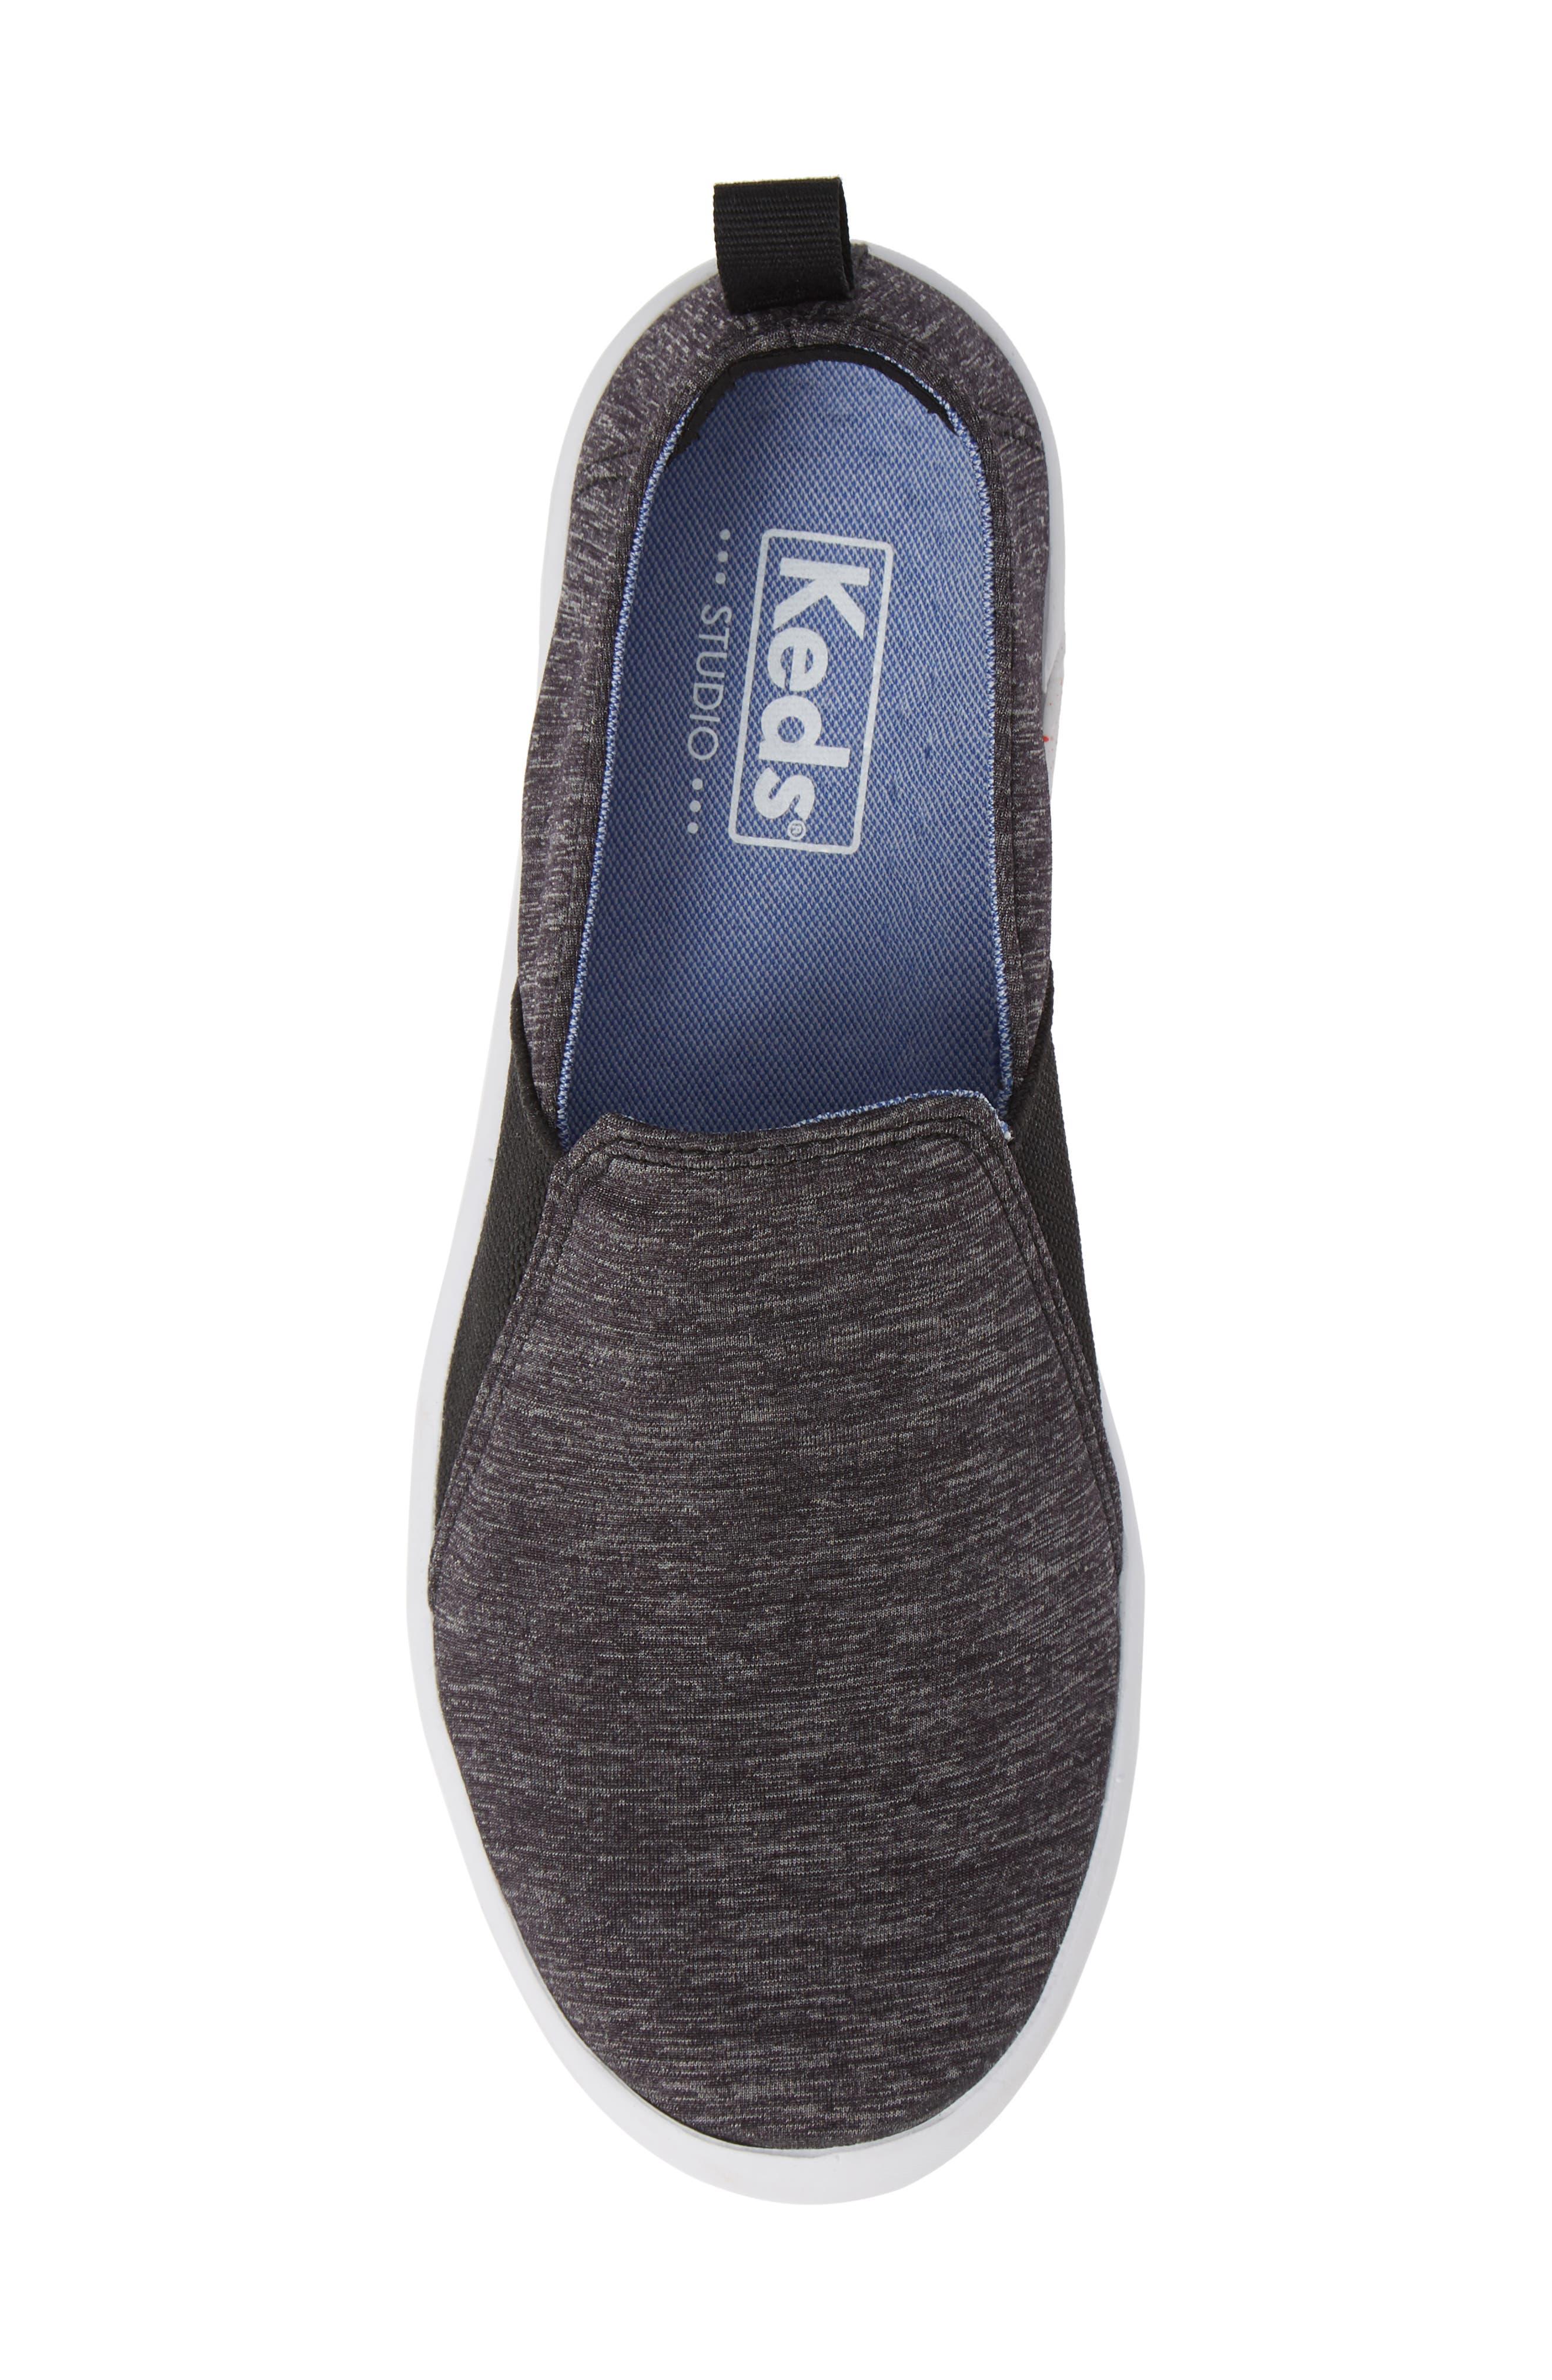 KEDS<SUP>®</SUP>, Studio Liv Active Knit Sneaker, Alternate thumbnail 5, color, BLACK